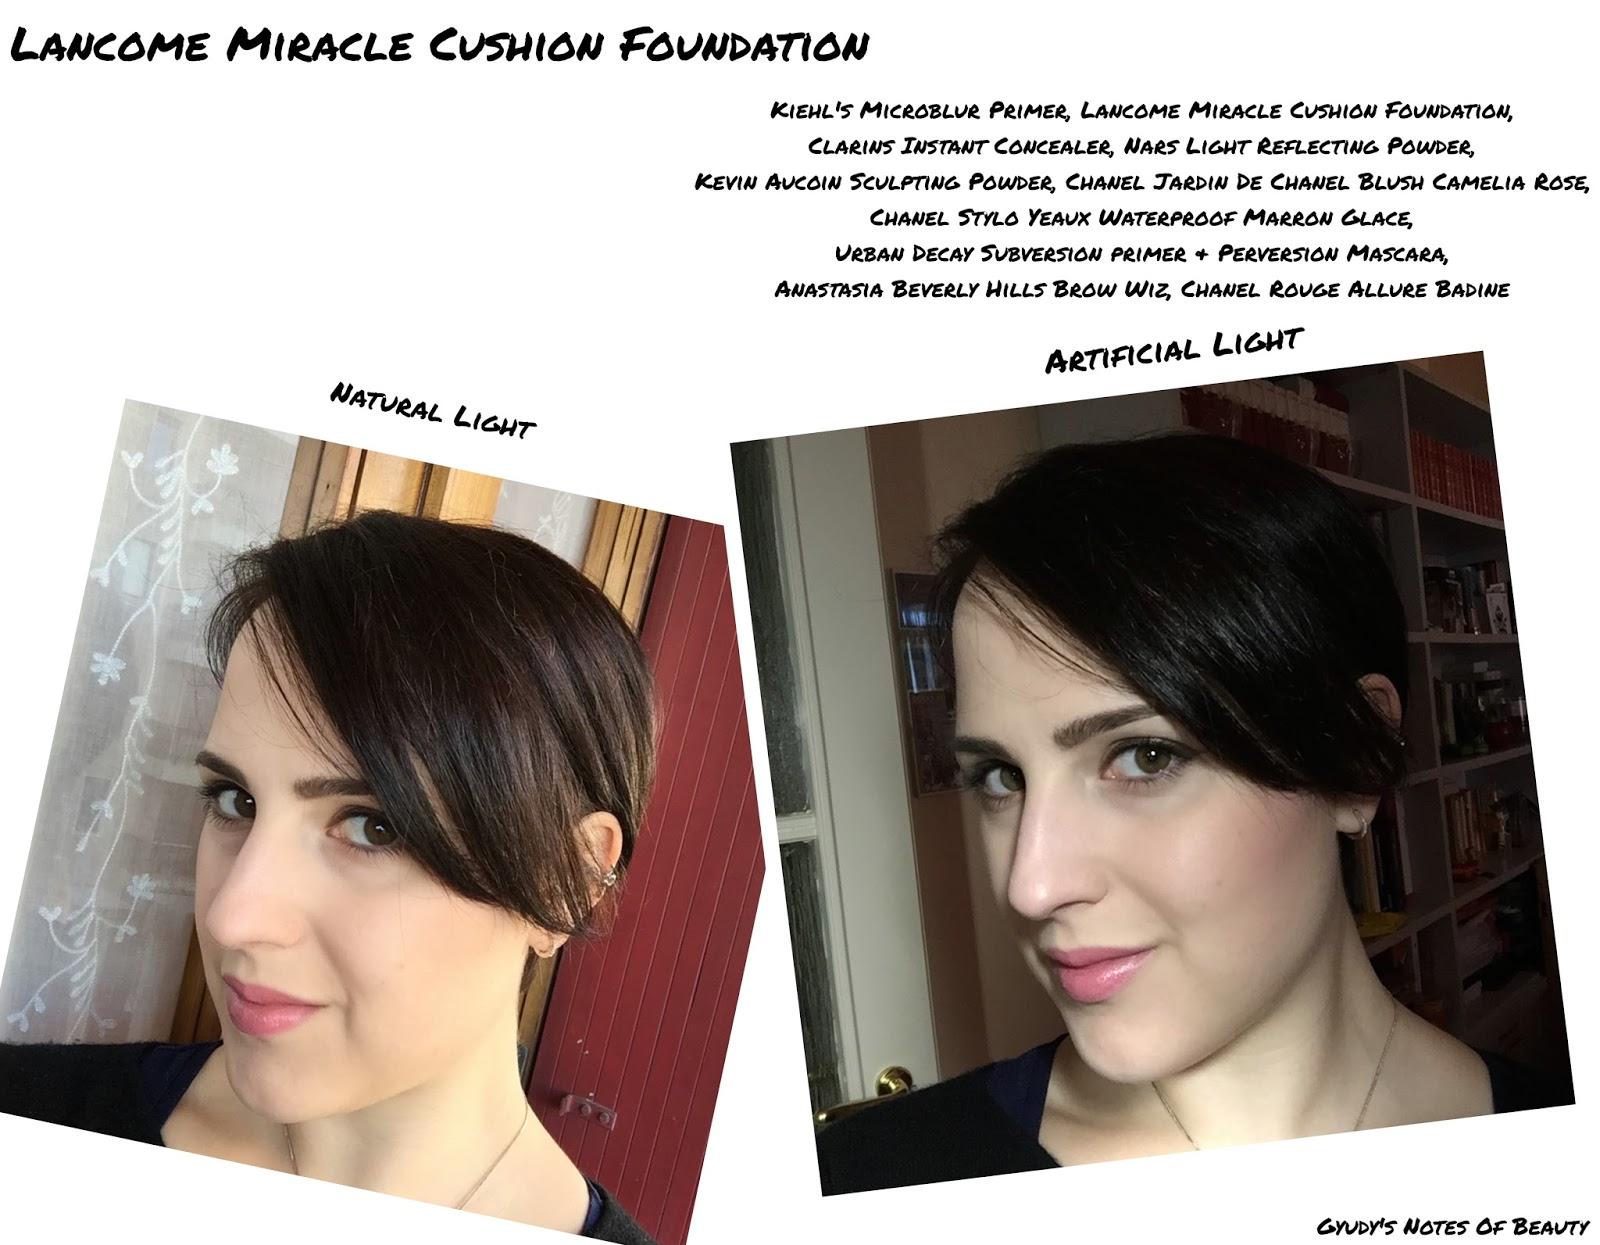 Lancome Miracle Cushion Foundation